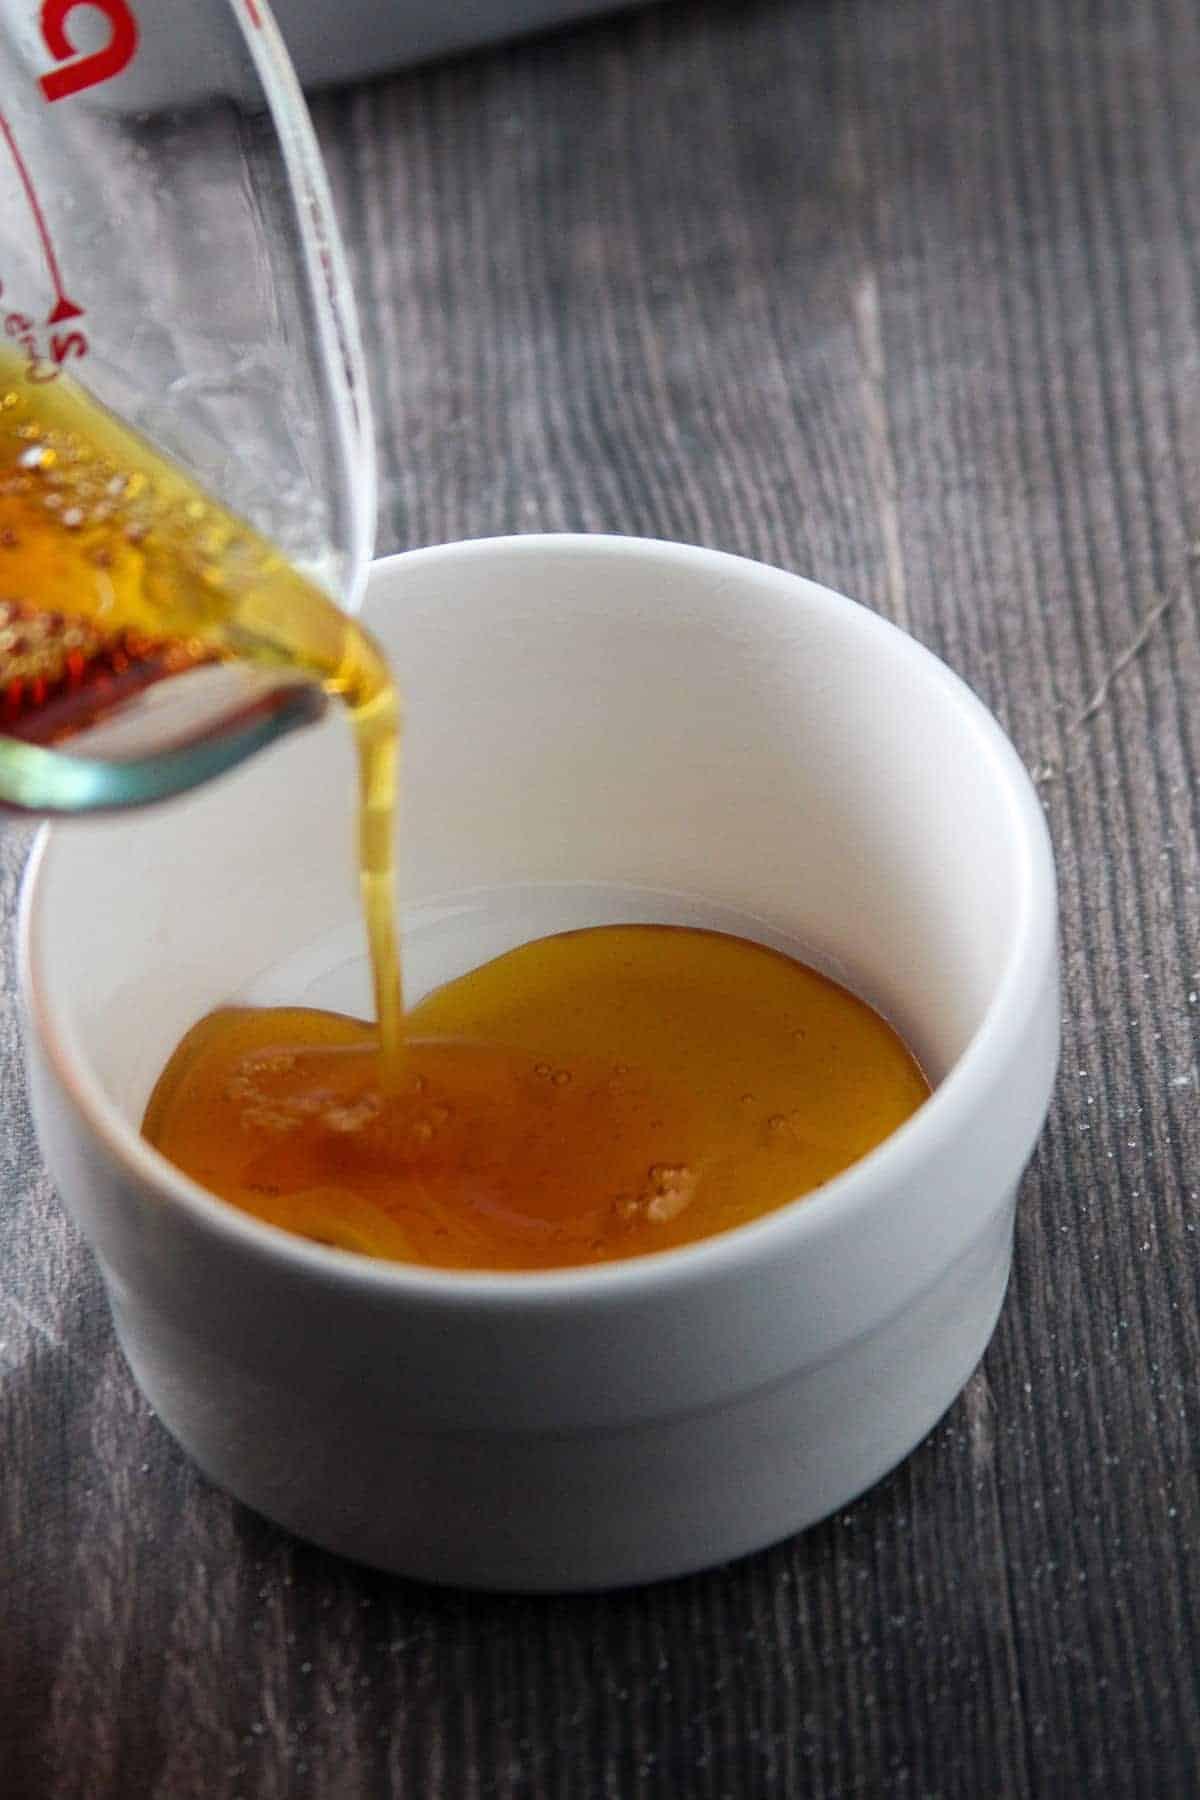 pouring caramel into ramekins